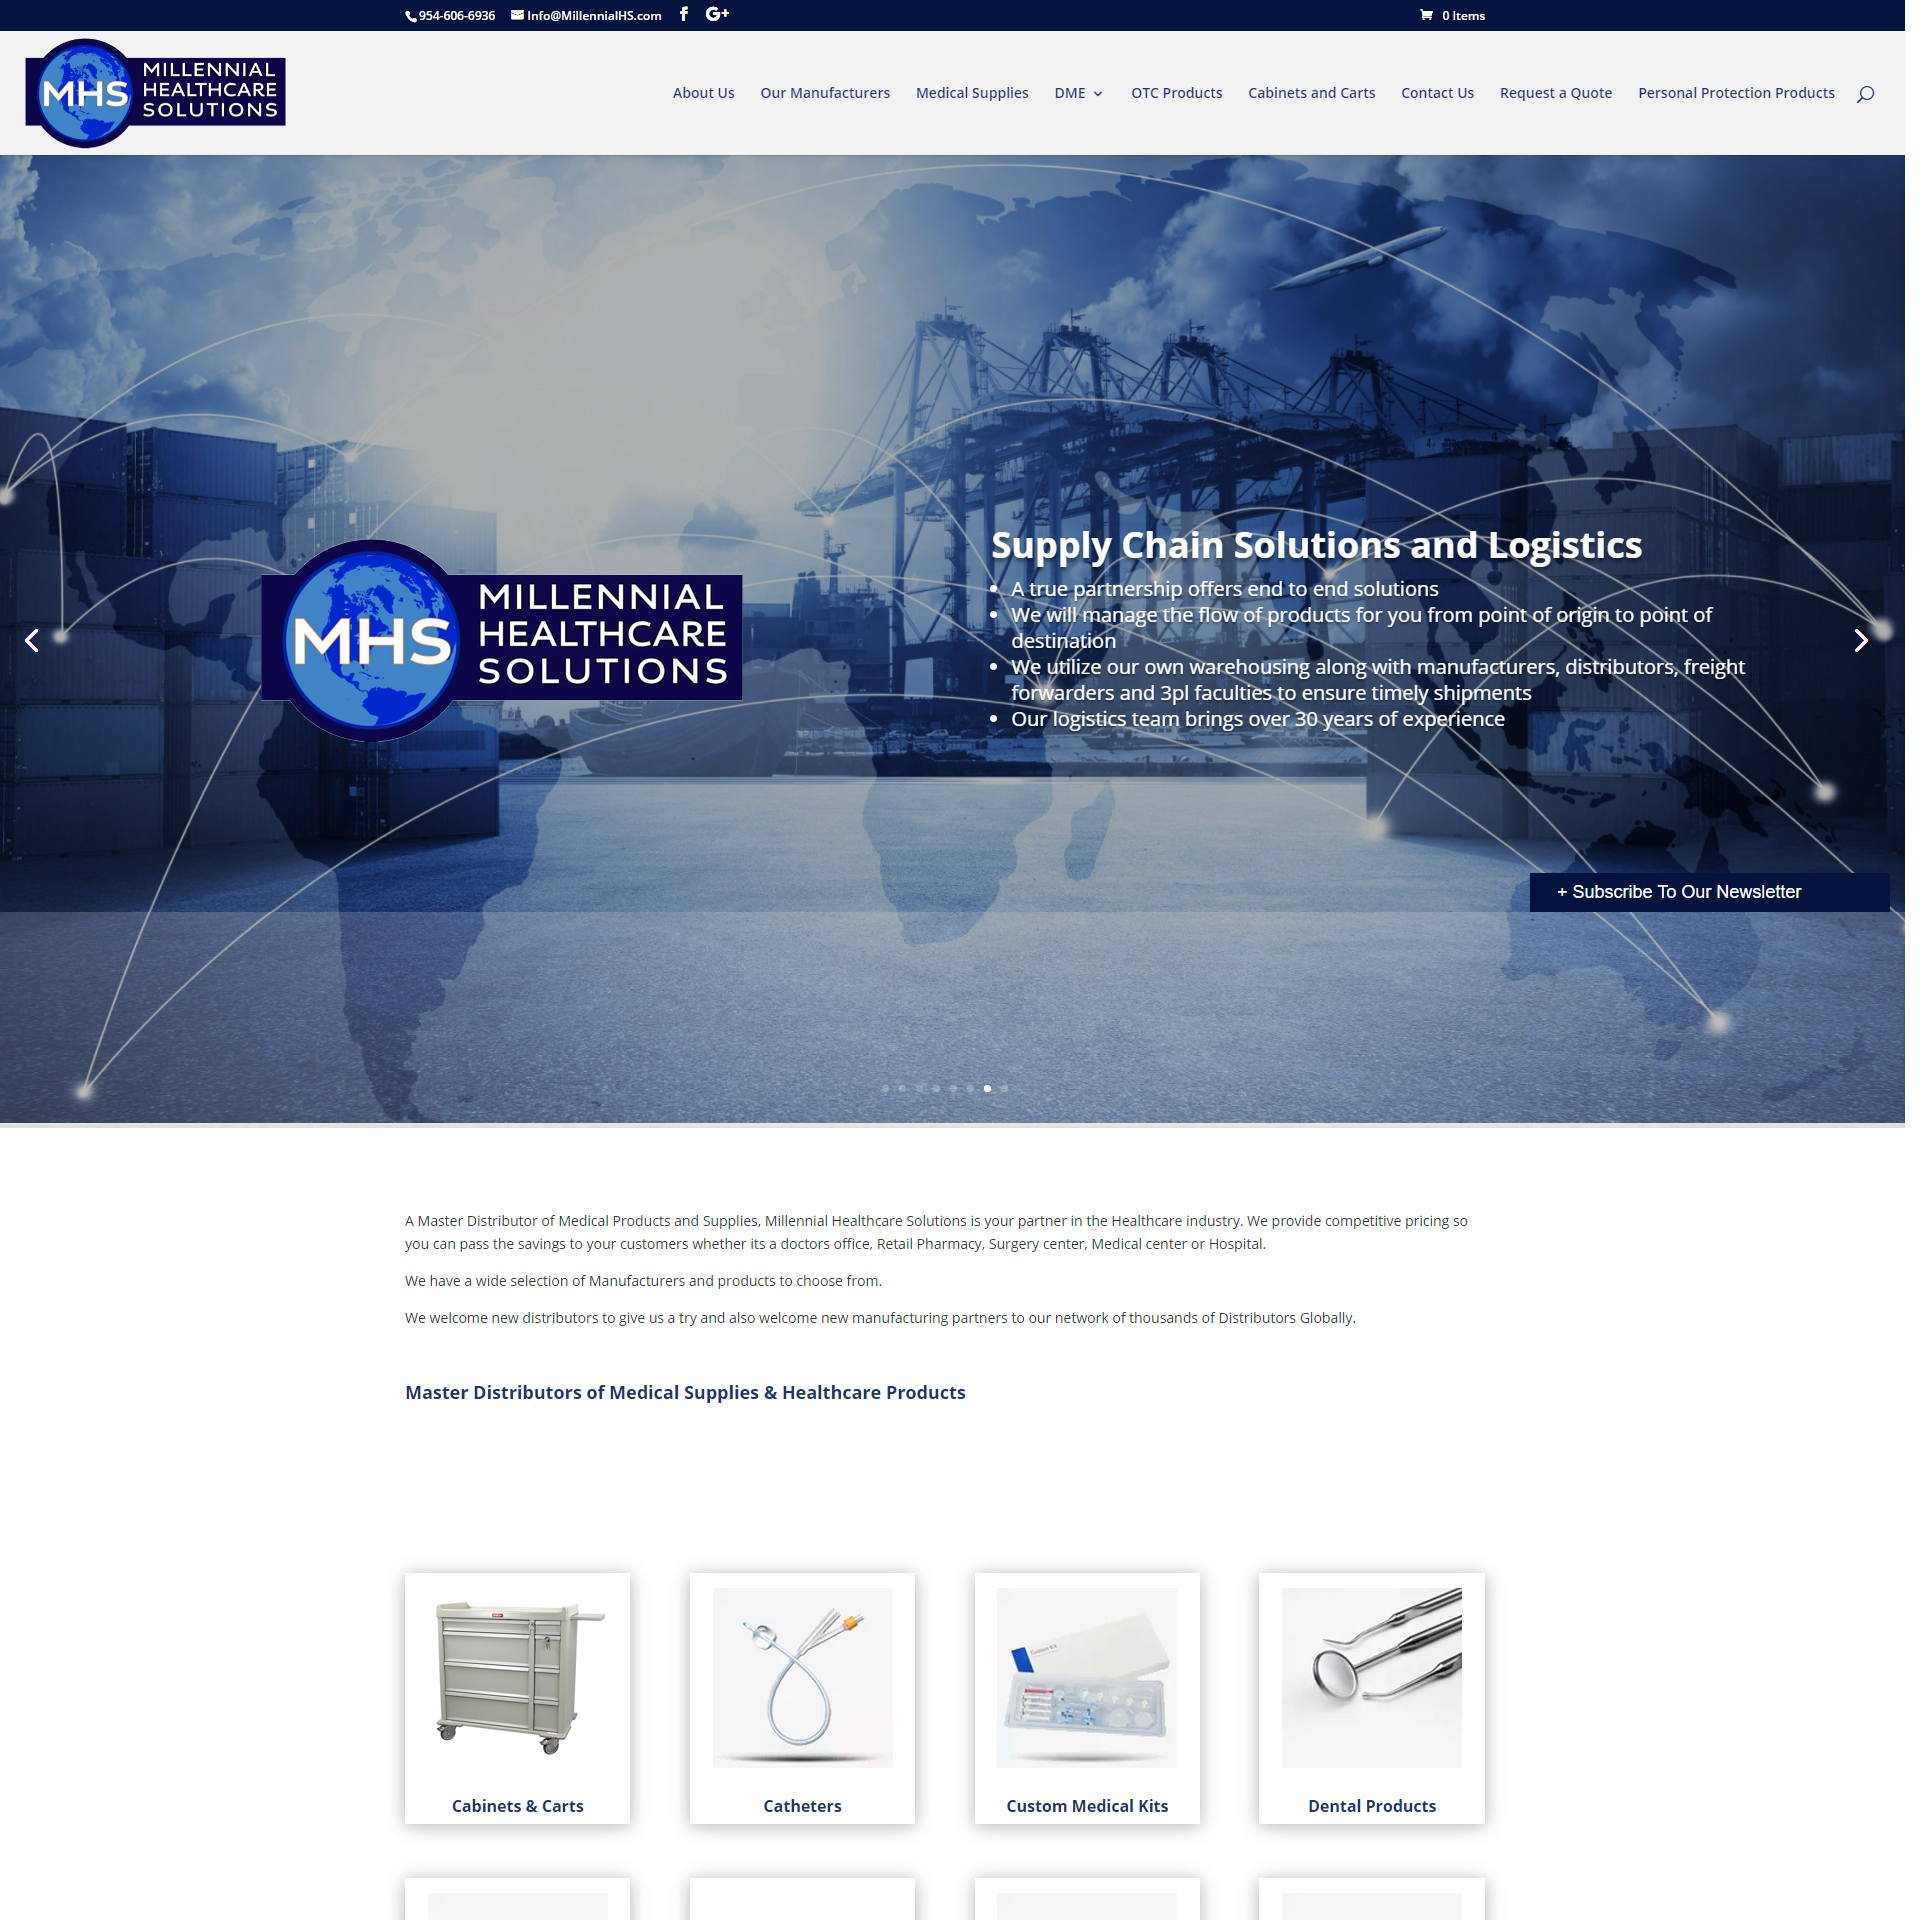 Millennial Healthcare Solutions Website Design and Development